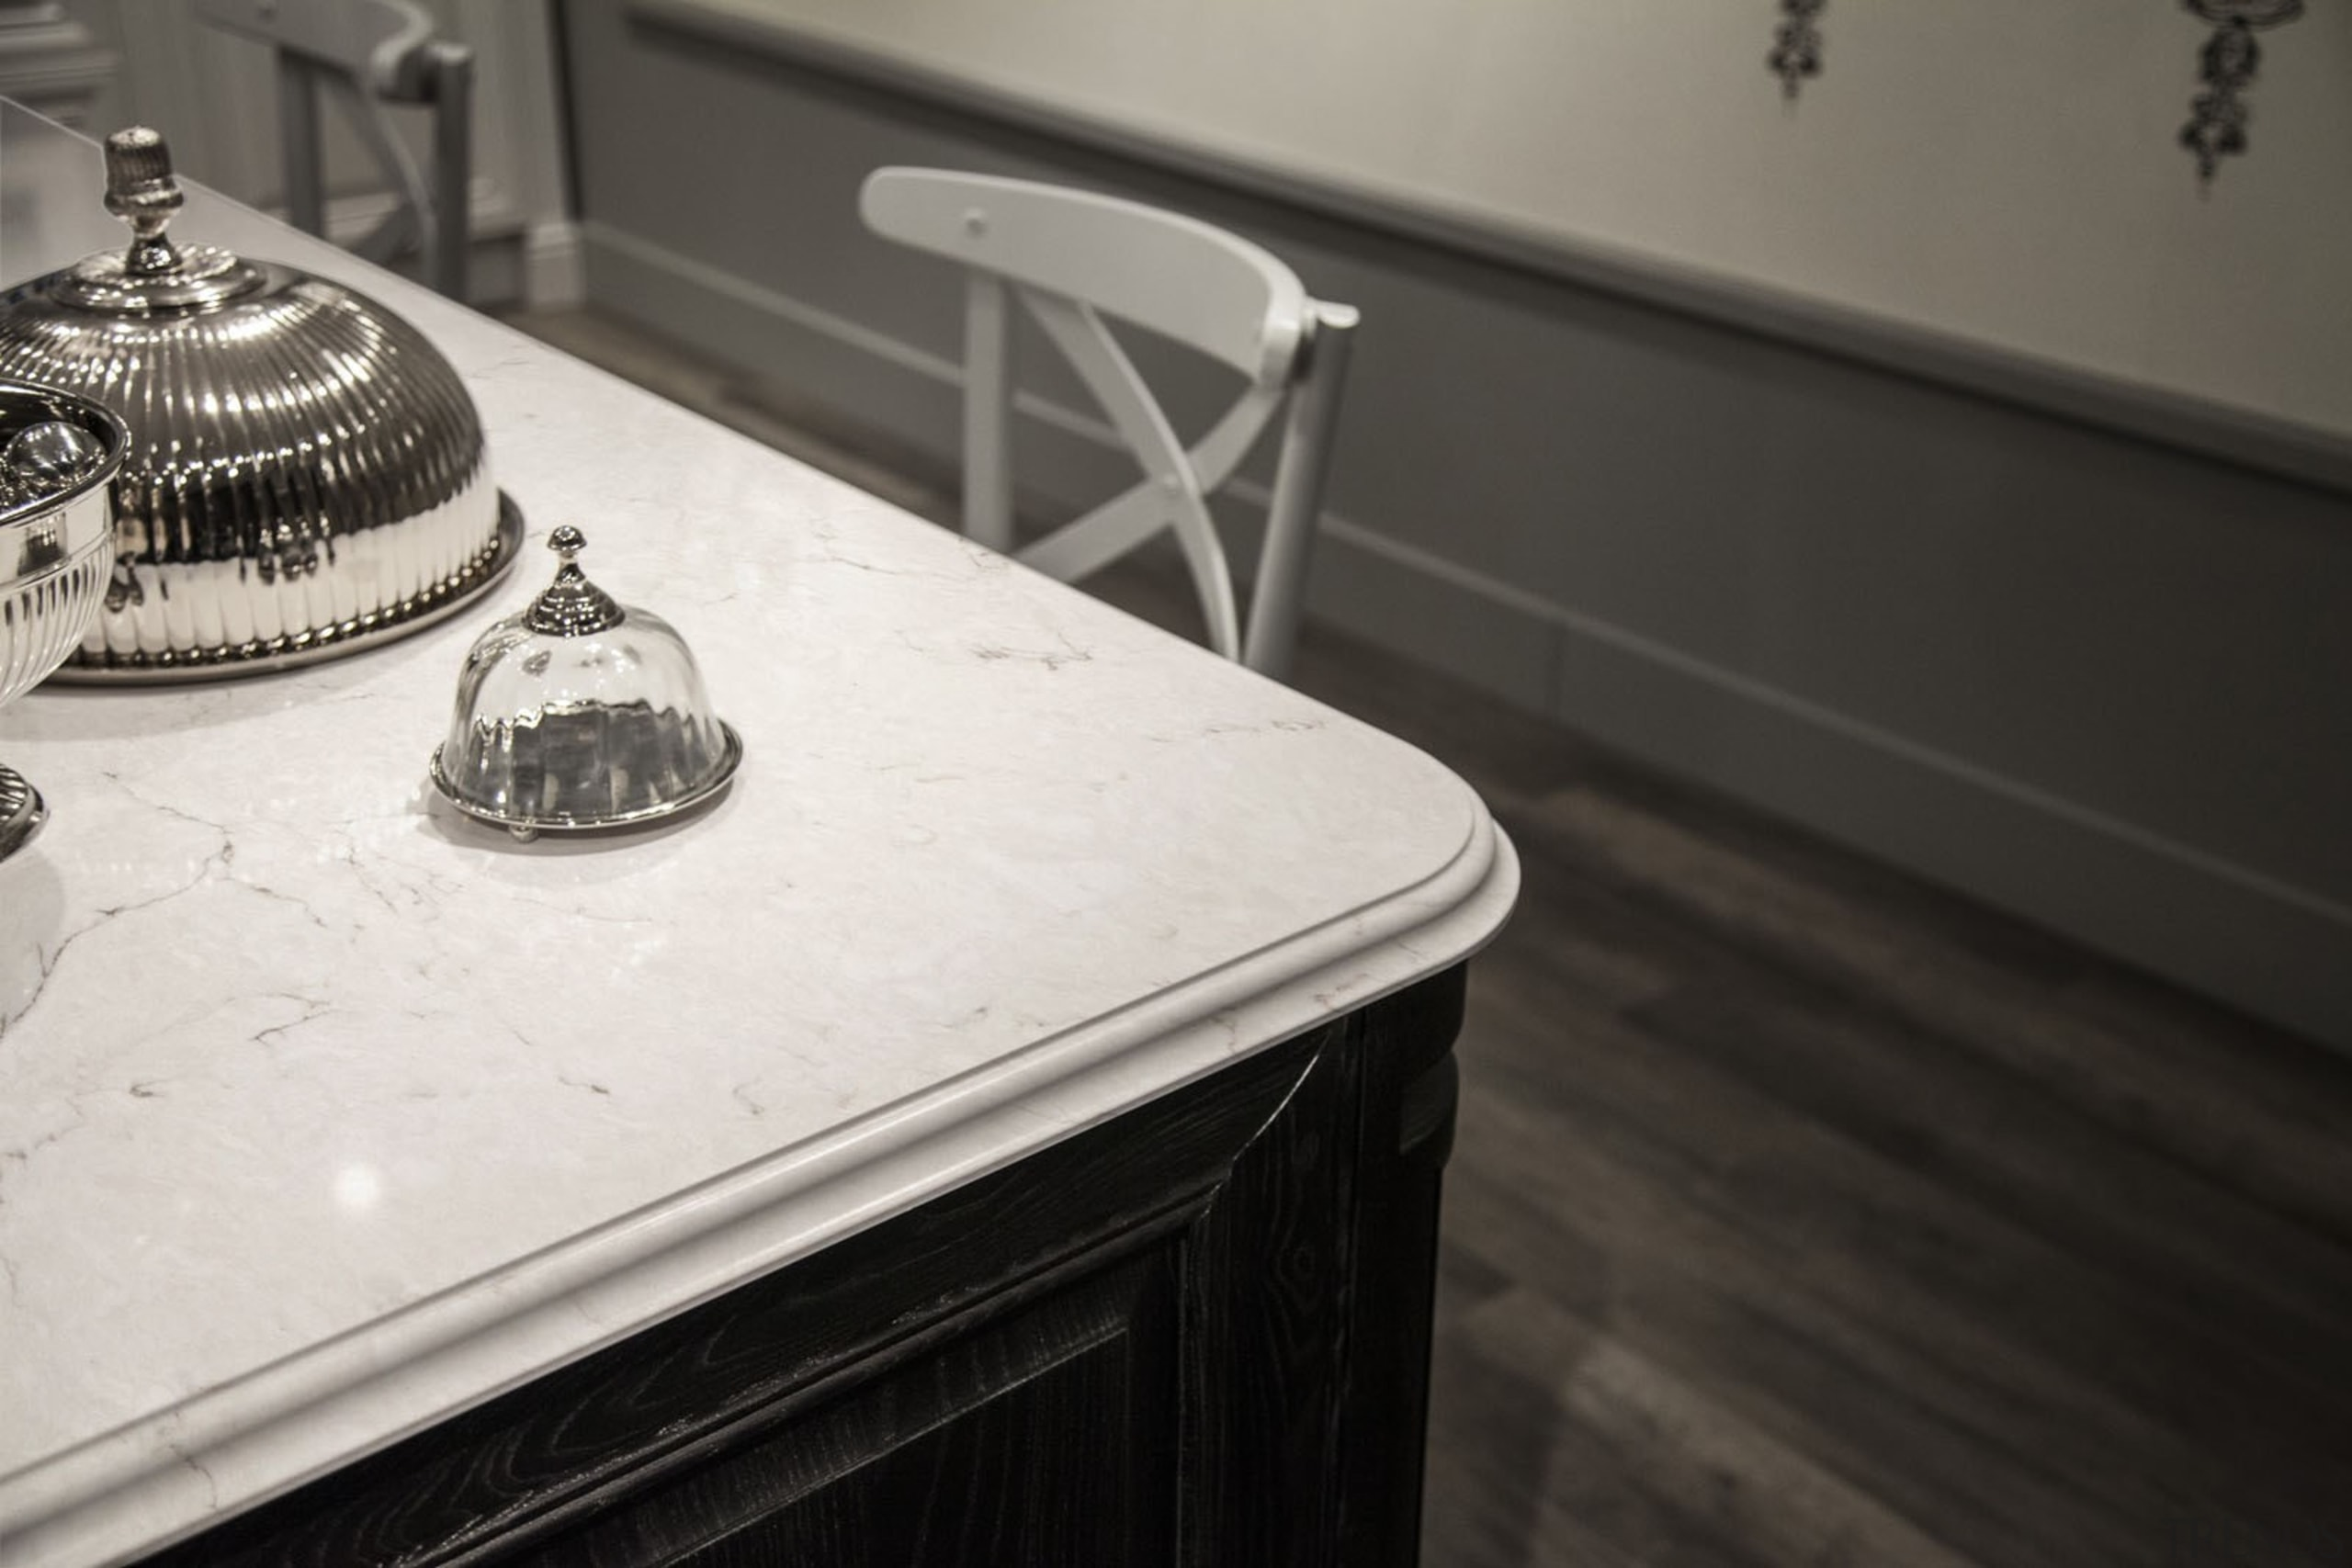 Snowy Ibiza - Kichen Detail  - Snowy black and white, countertop, floor, flooring, furniture, interior design, table, black, white